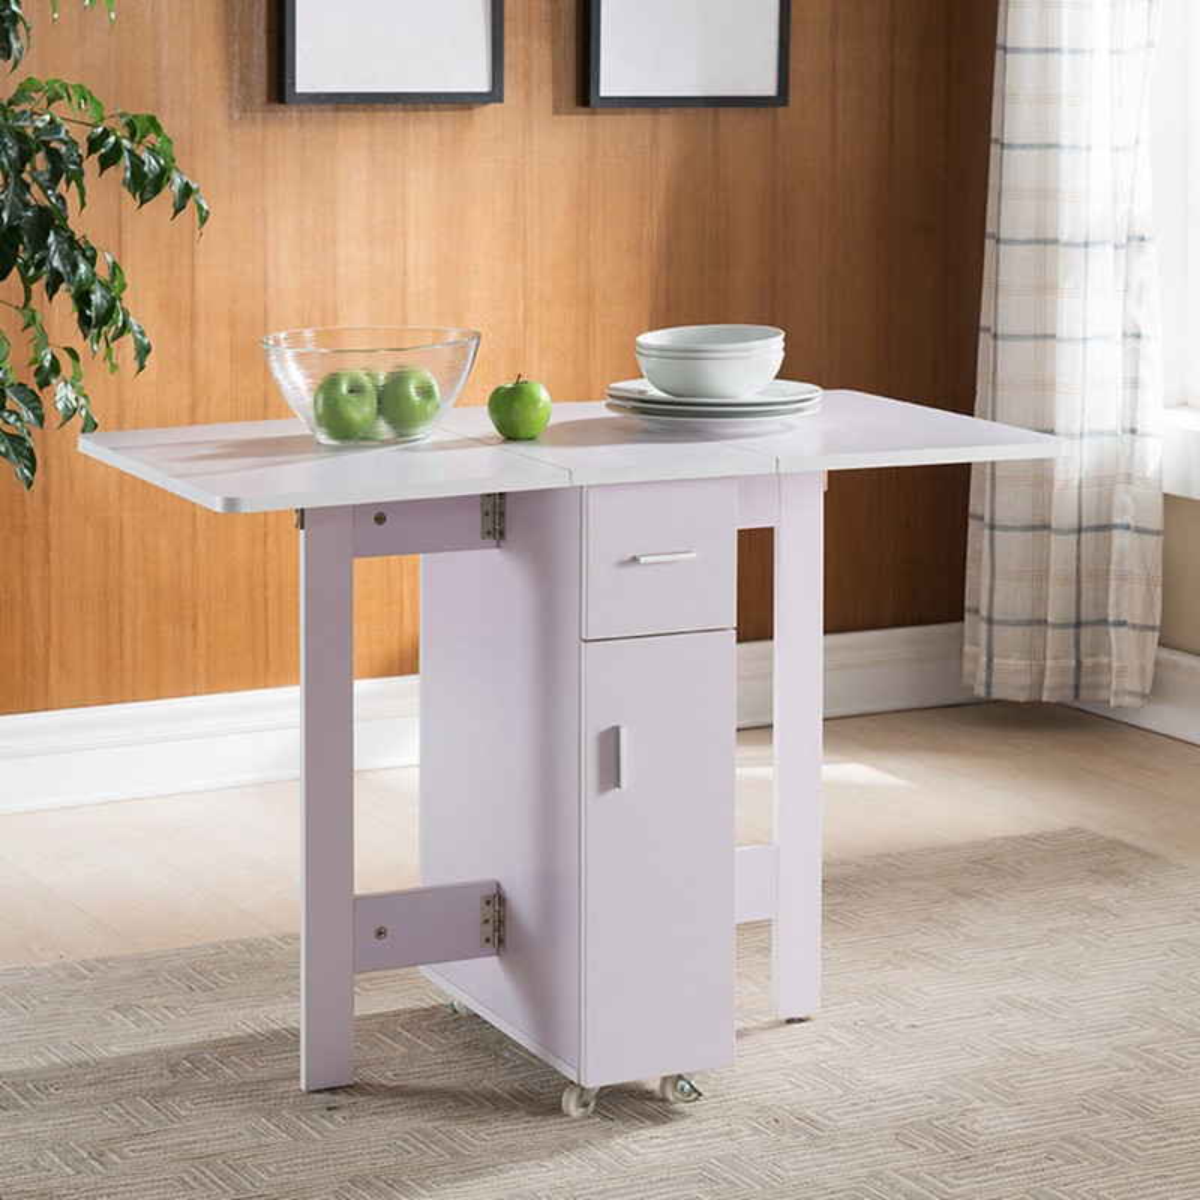 MR多功能餐車餐桌